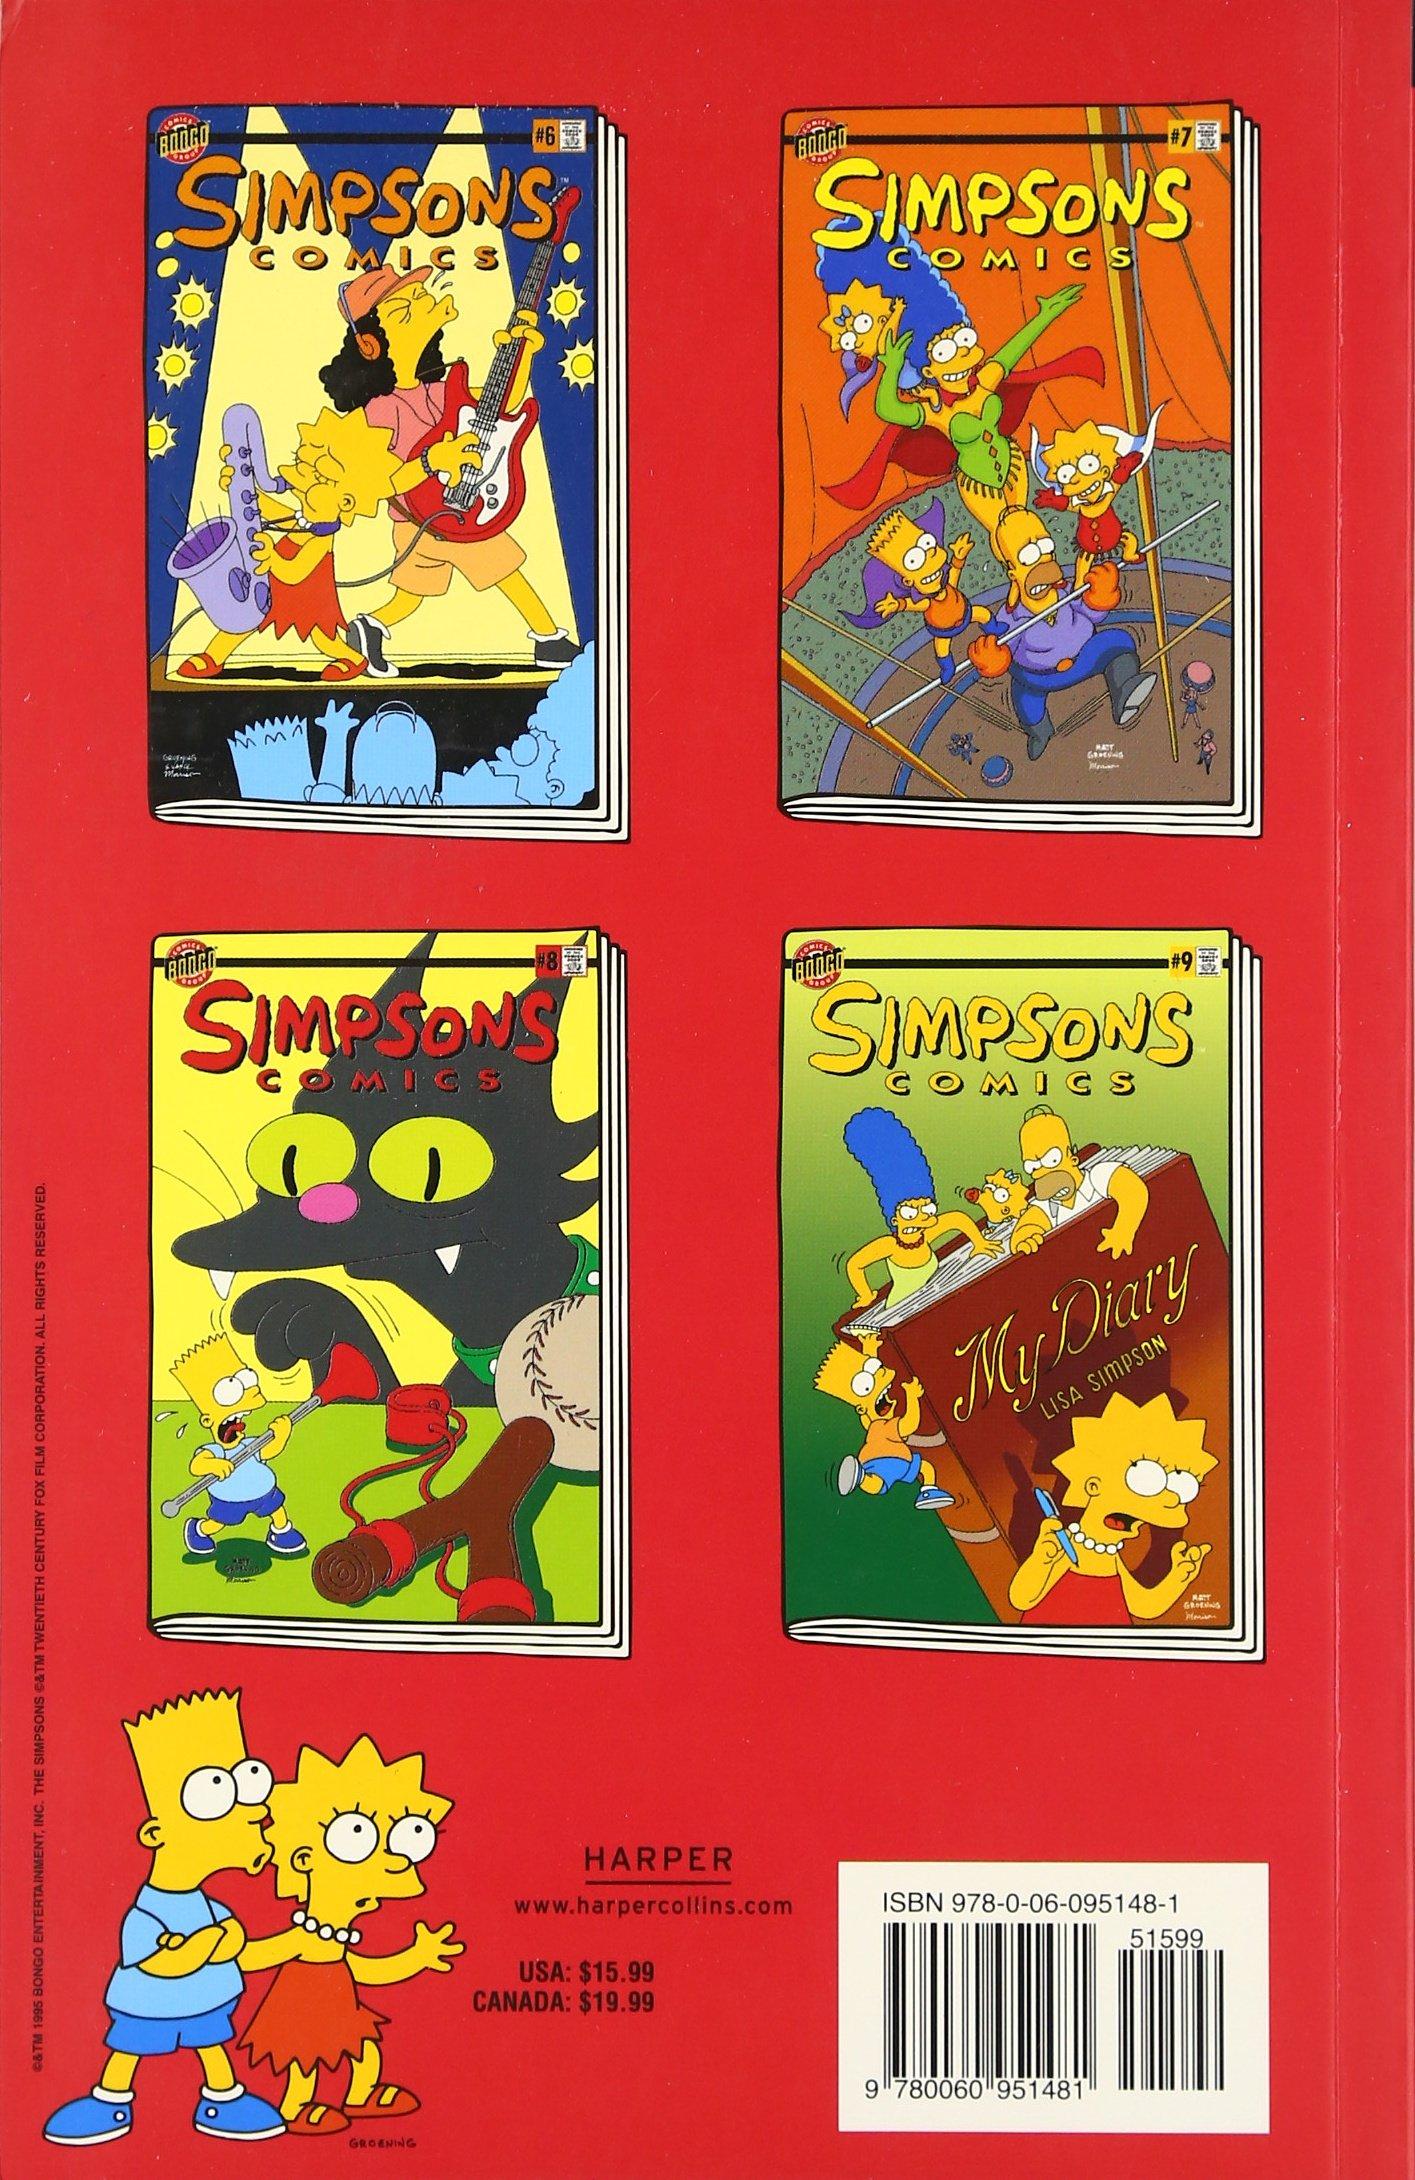 Simpsons ics Spectacular Simpsons ics pilations Matt